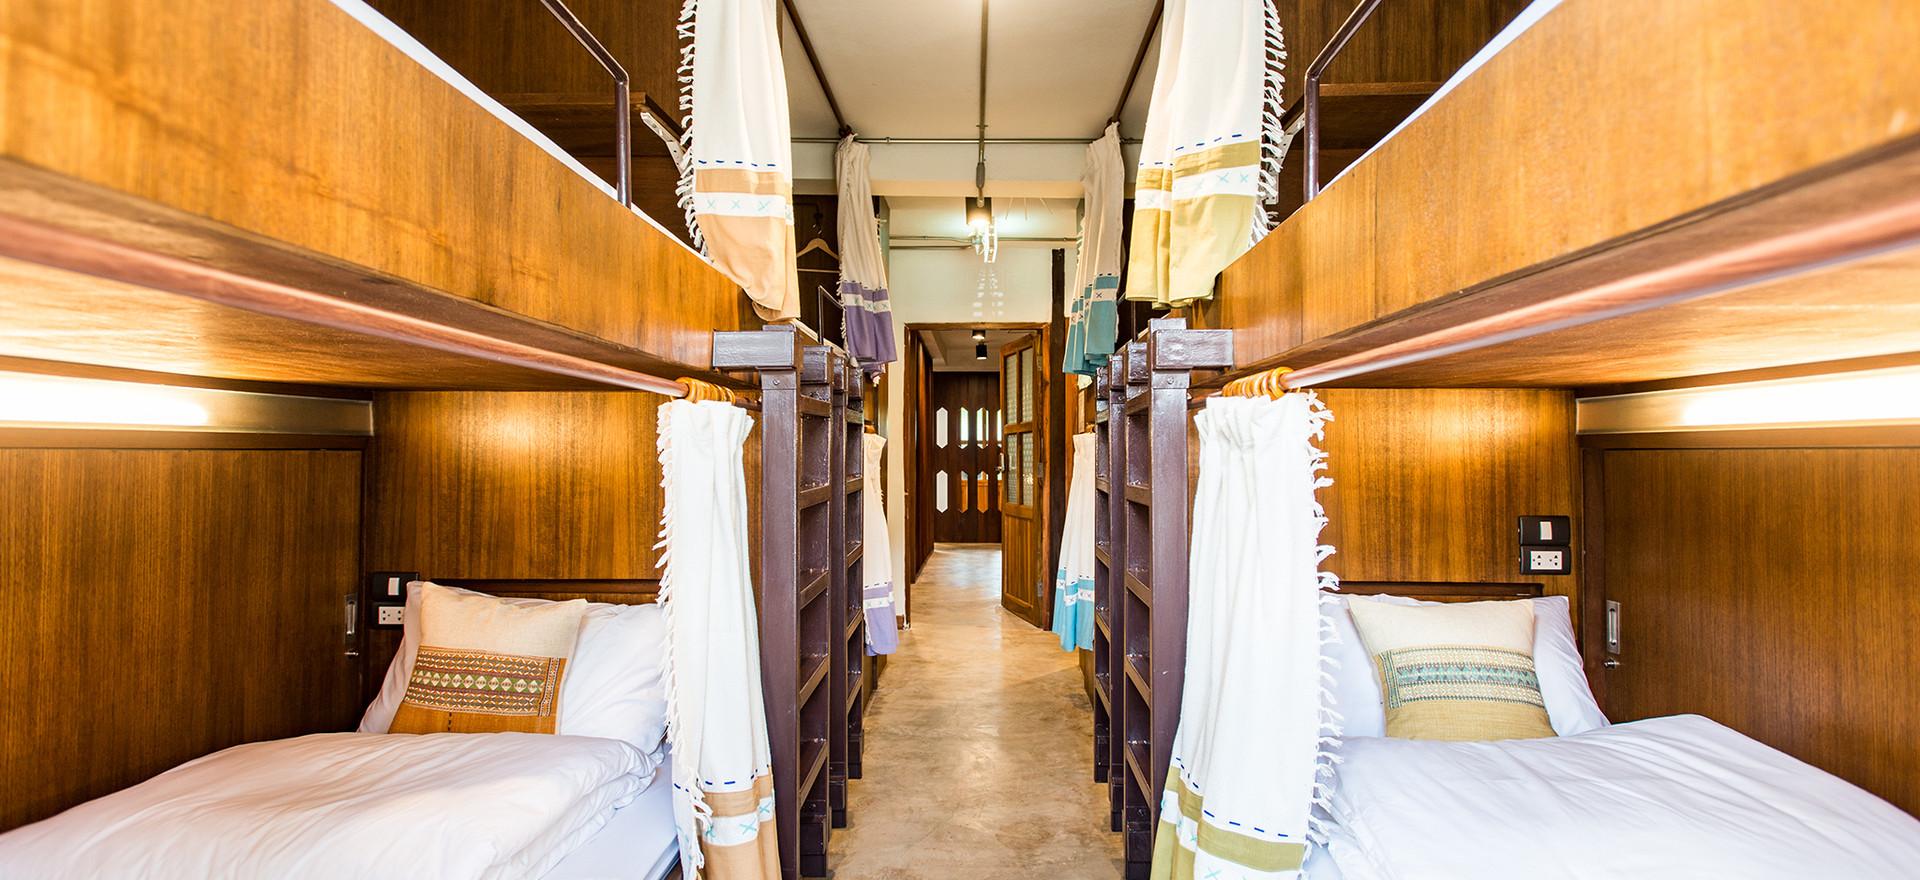 10 Beds Female Dorm